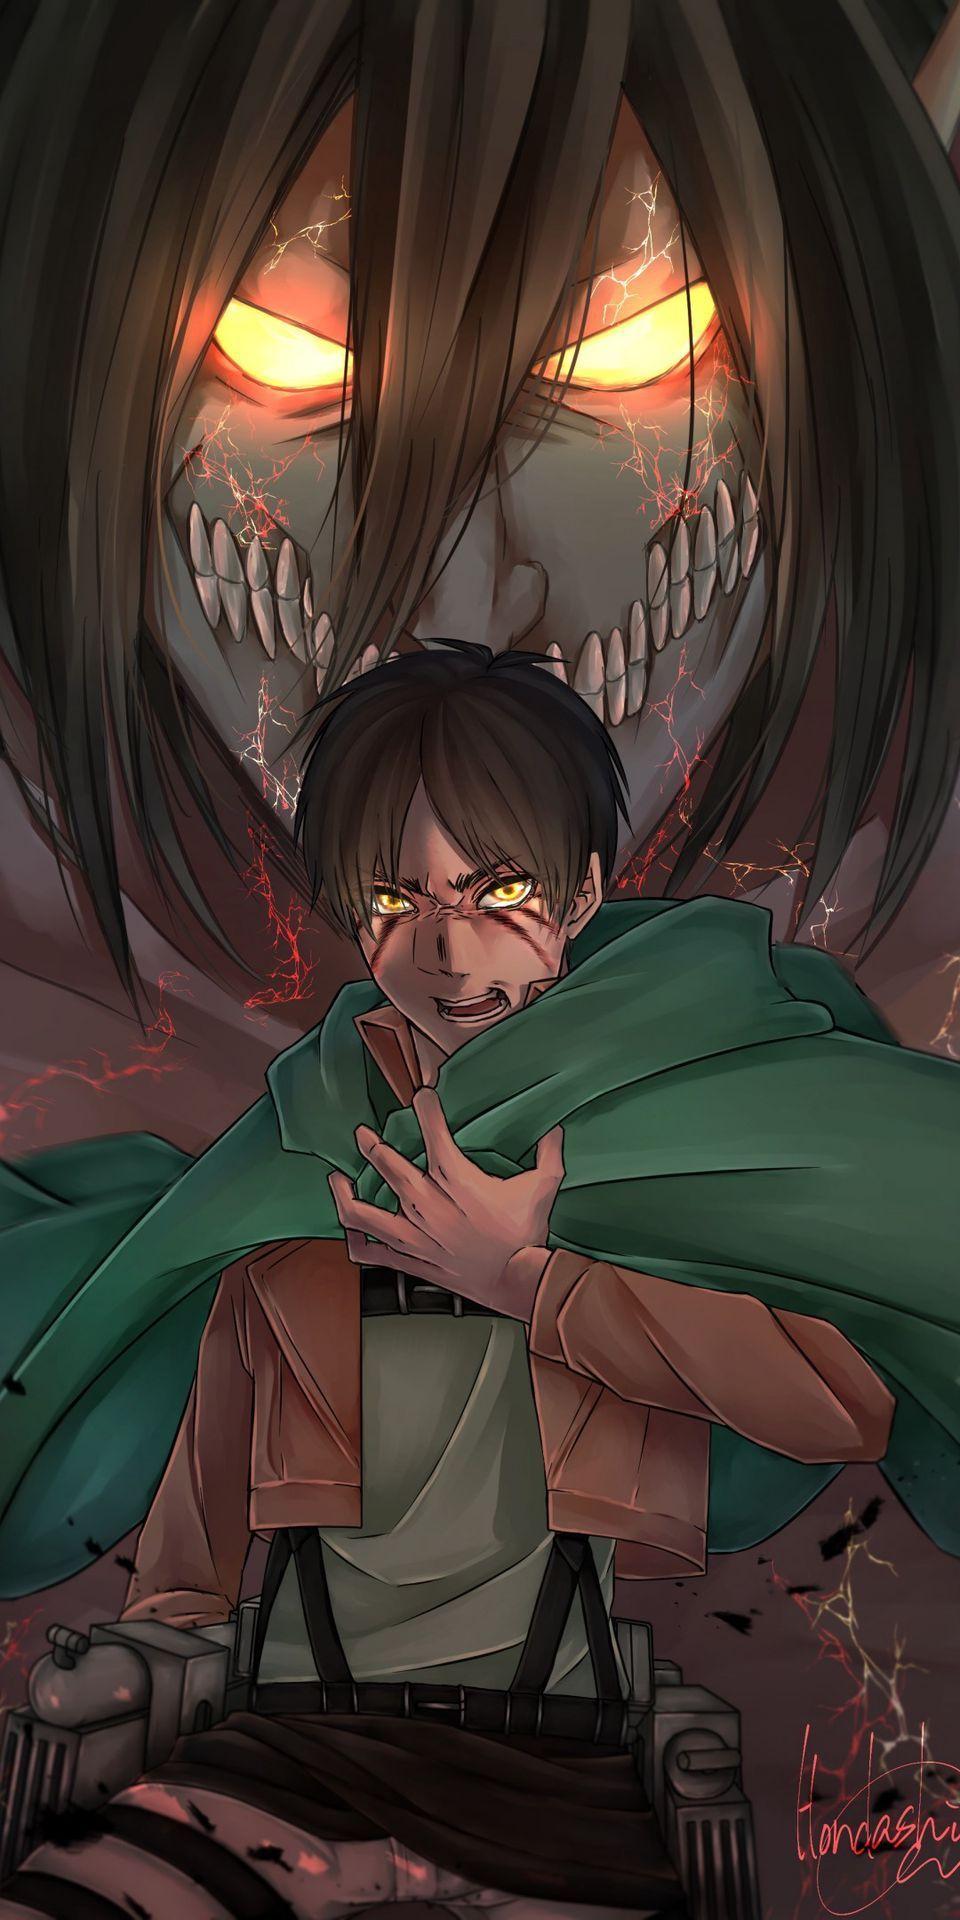 Un Amor De Titanes Eren X Annie Parte 7 Que Te Ha Pasado Kyojin Titanes Anime Ataque De Los Titanes